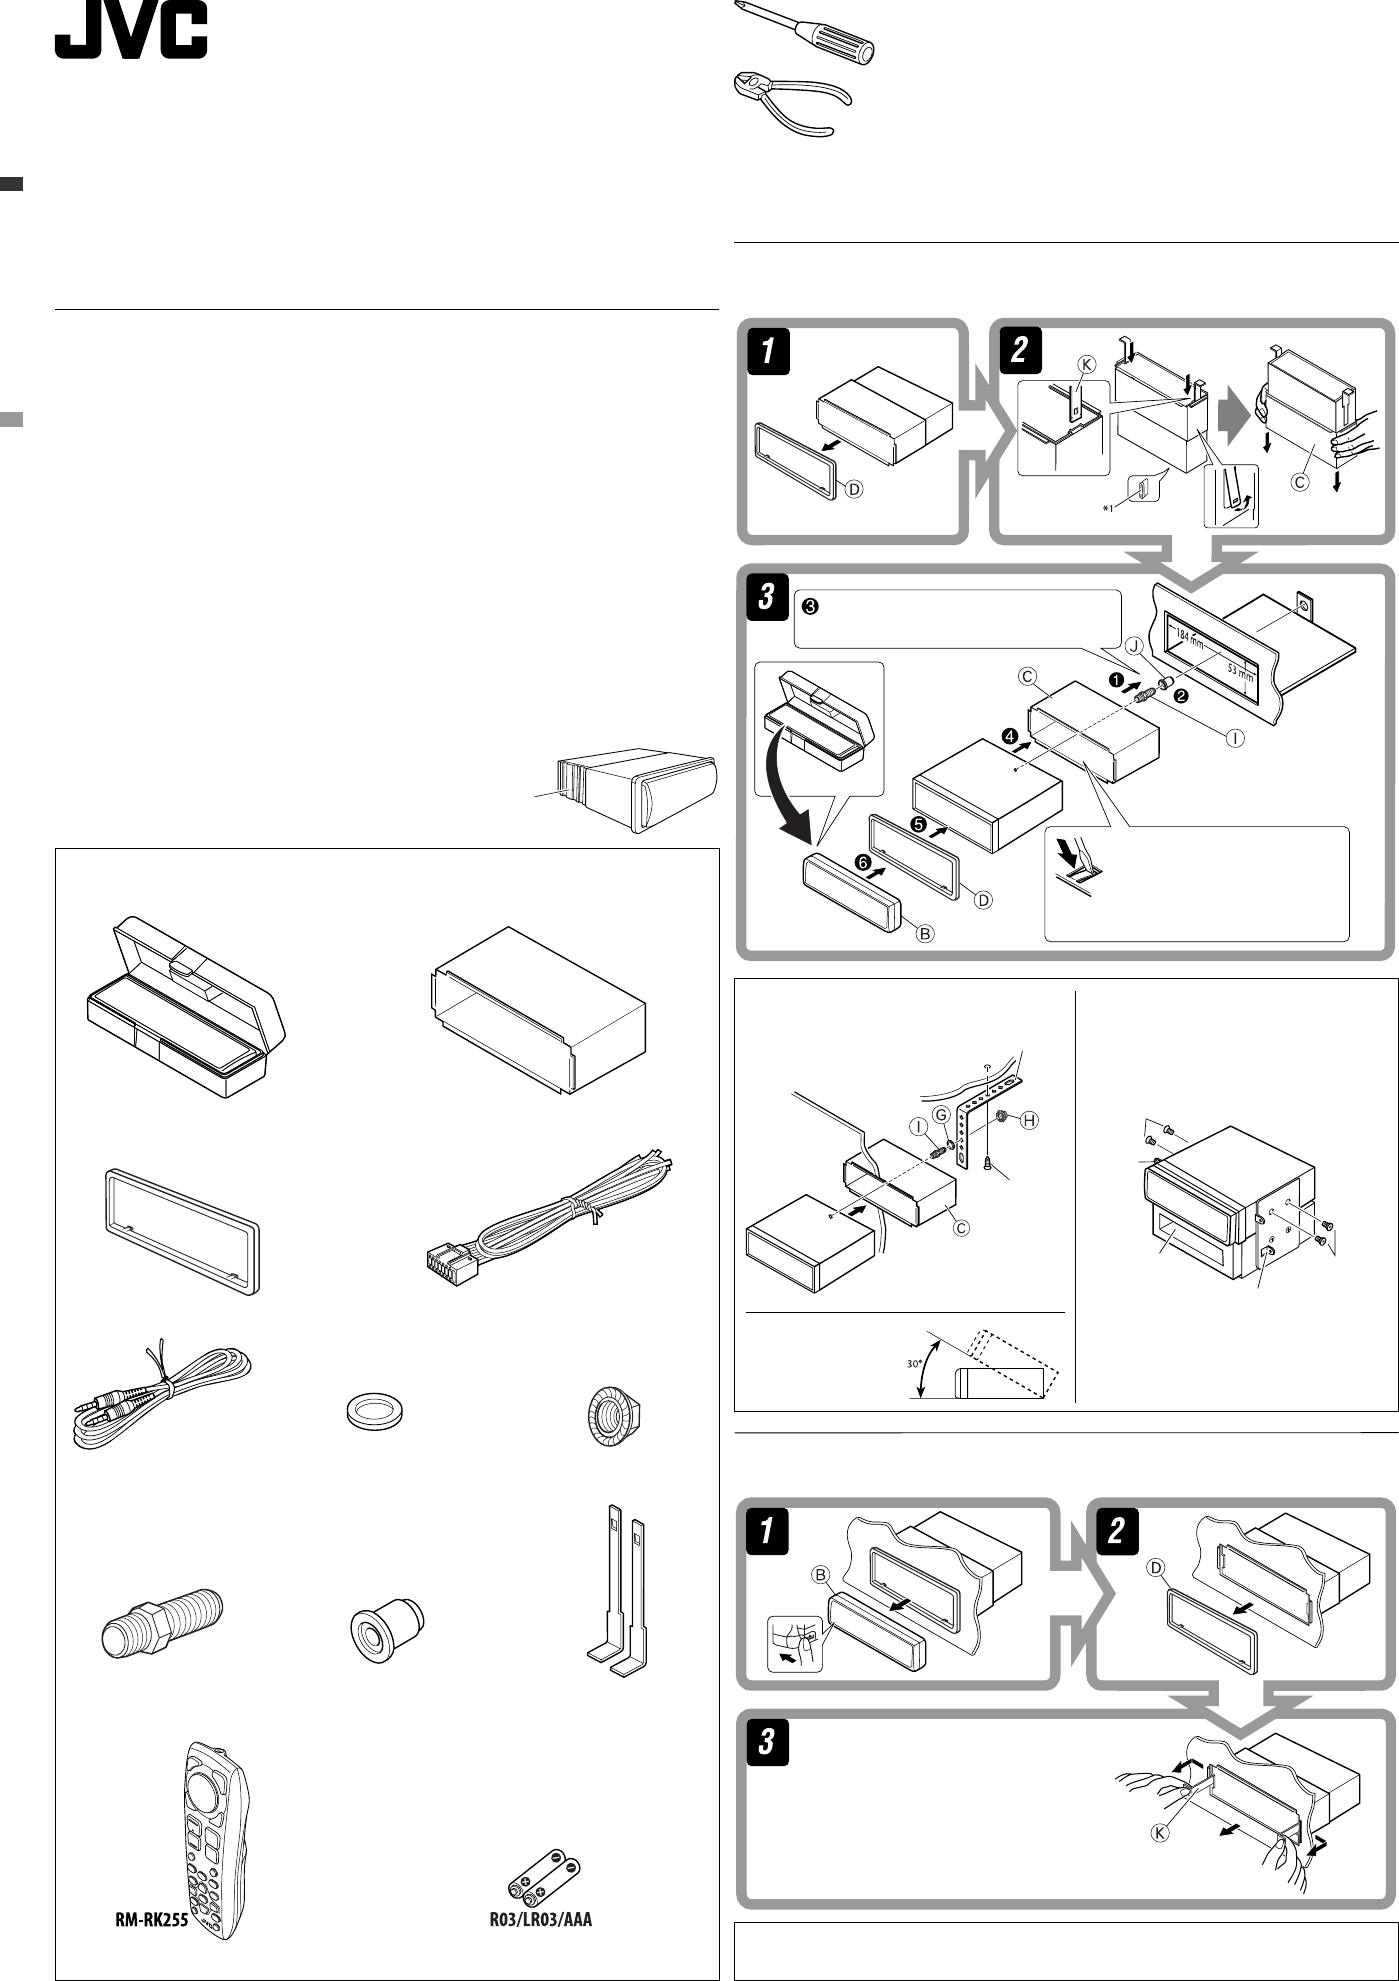 [DHAV_9290]  JVC KD DV5504UI Install1_KD DV5506_008A_f User Manual GET0606 008B | Jvc K Series Circuit Diagram |  | UserManual.wiki